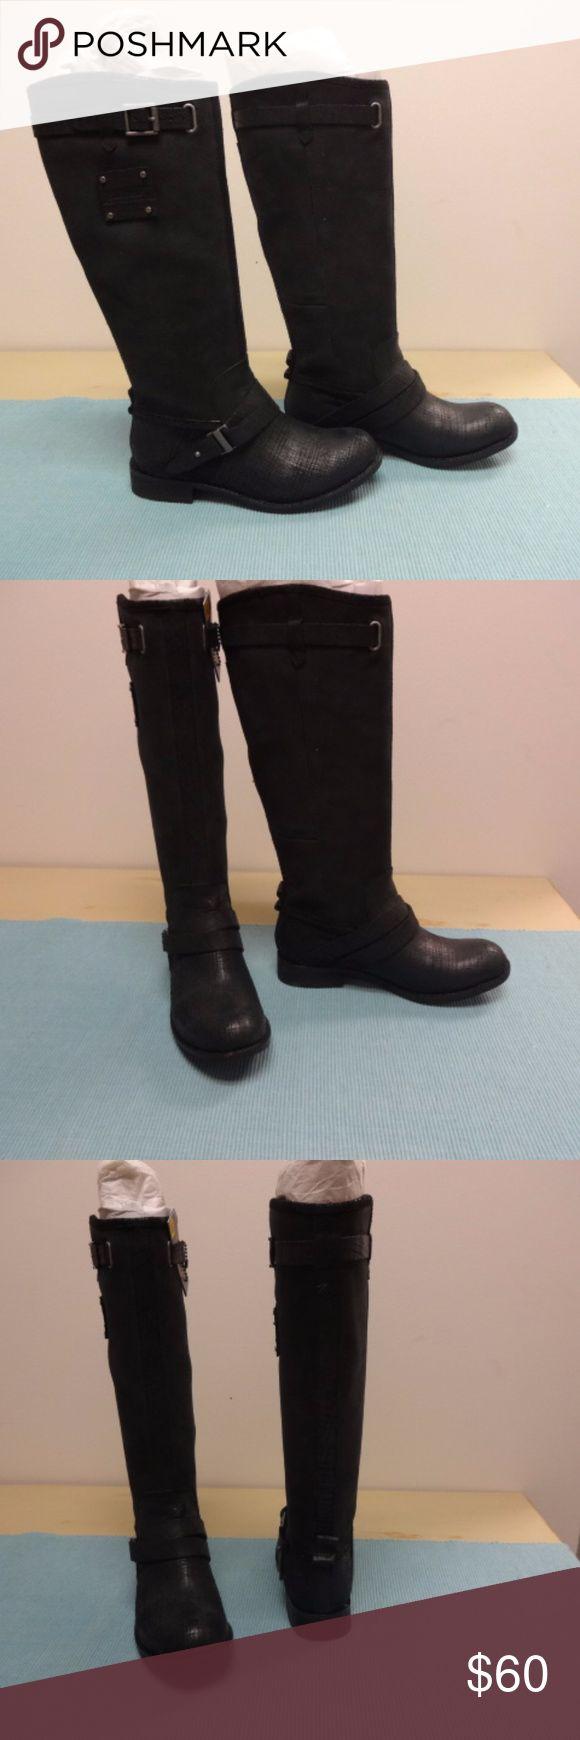 Caterpillar Women's Corrine Tall Boot Black New in the package  Never worn   Catepillar Women's Corrine Tall Boot black Caterpillar Shoes